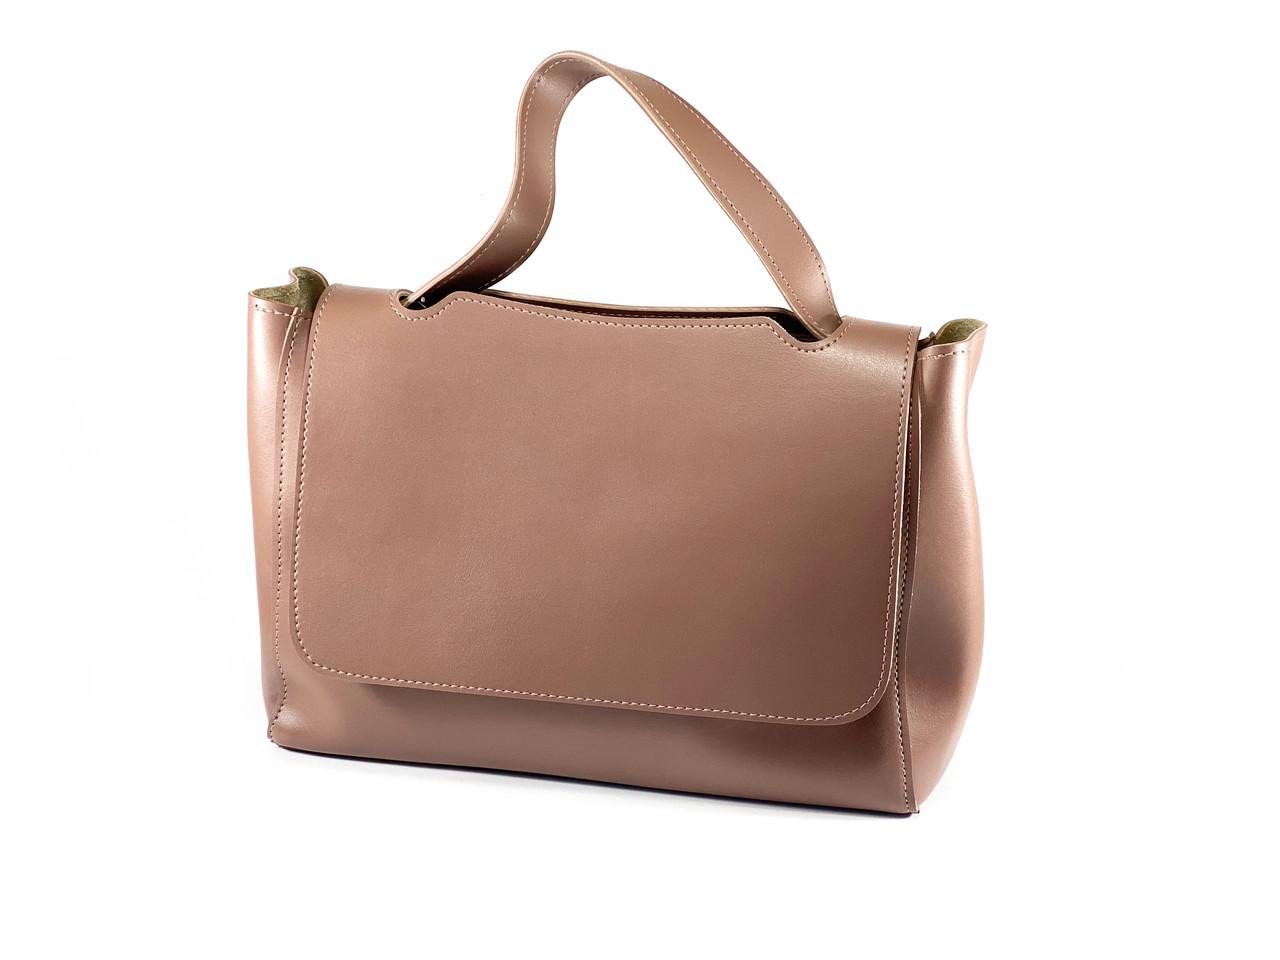 Модная женская сумка - Темная Пудра